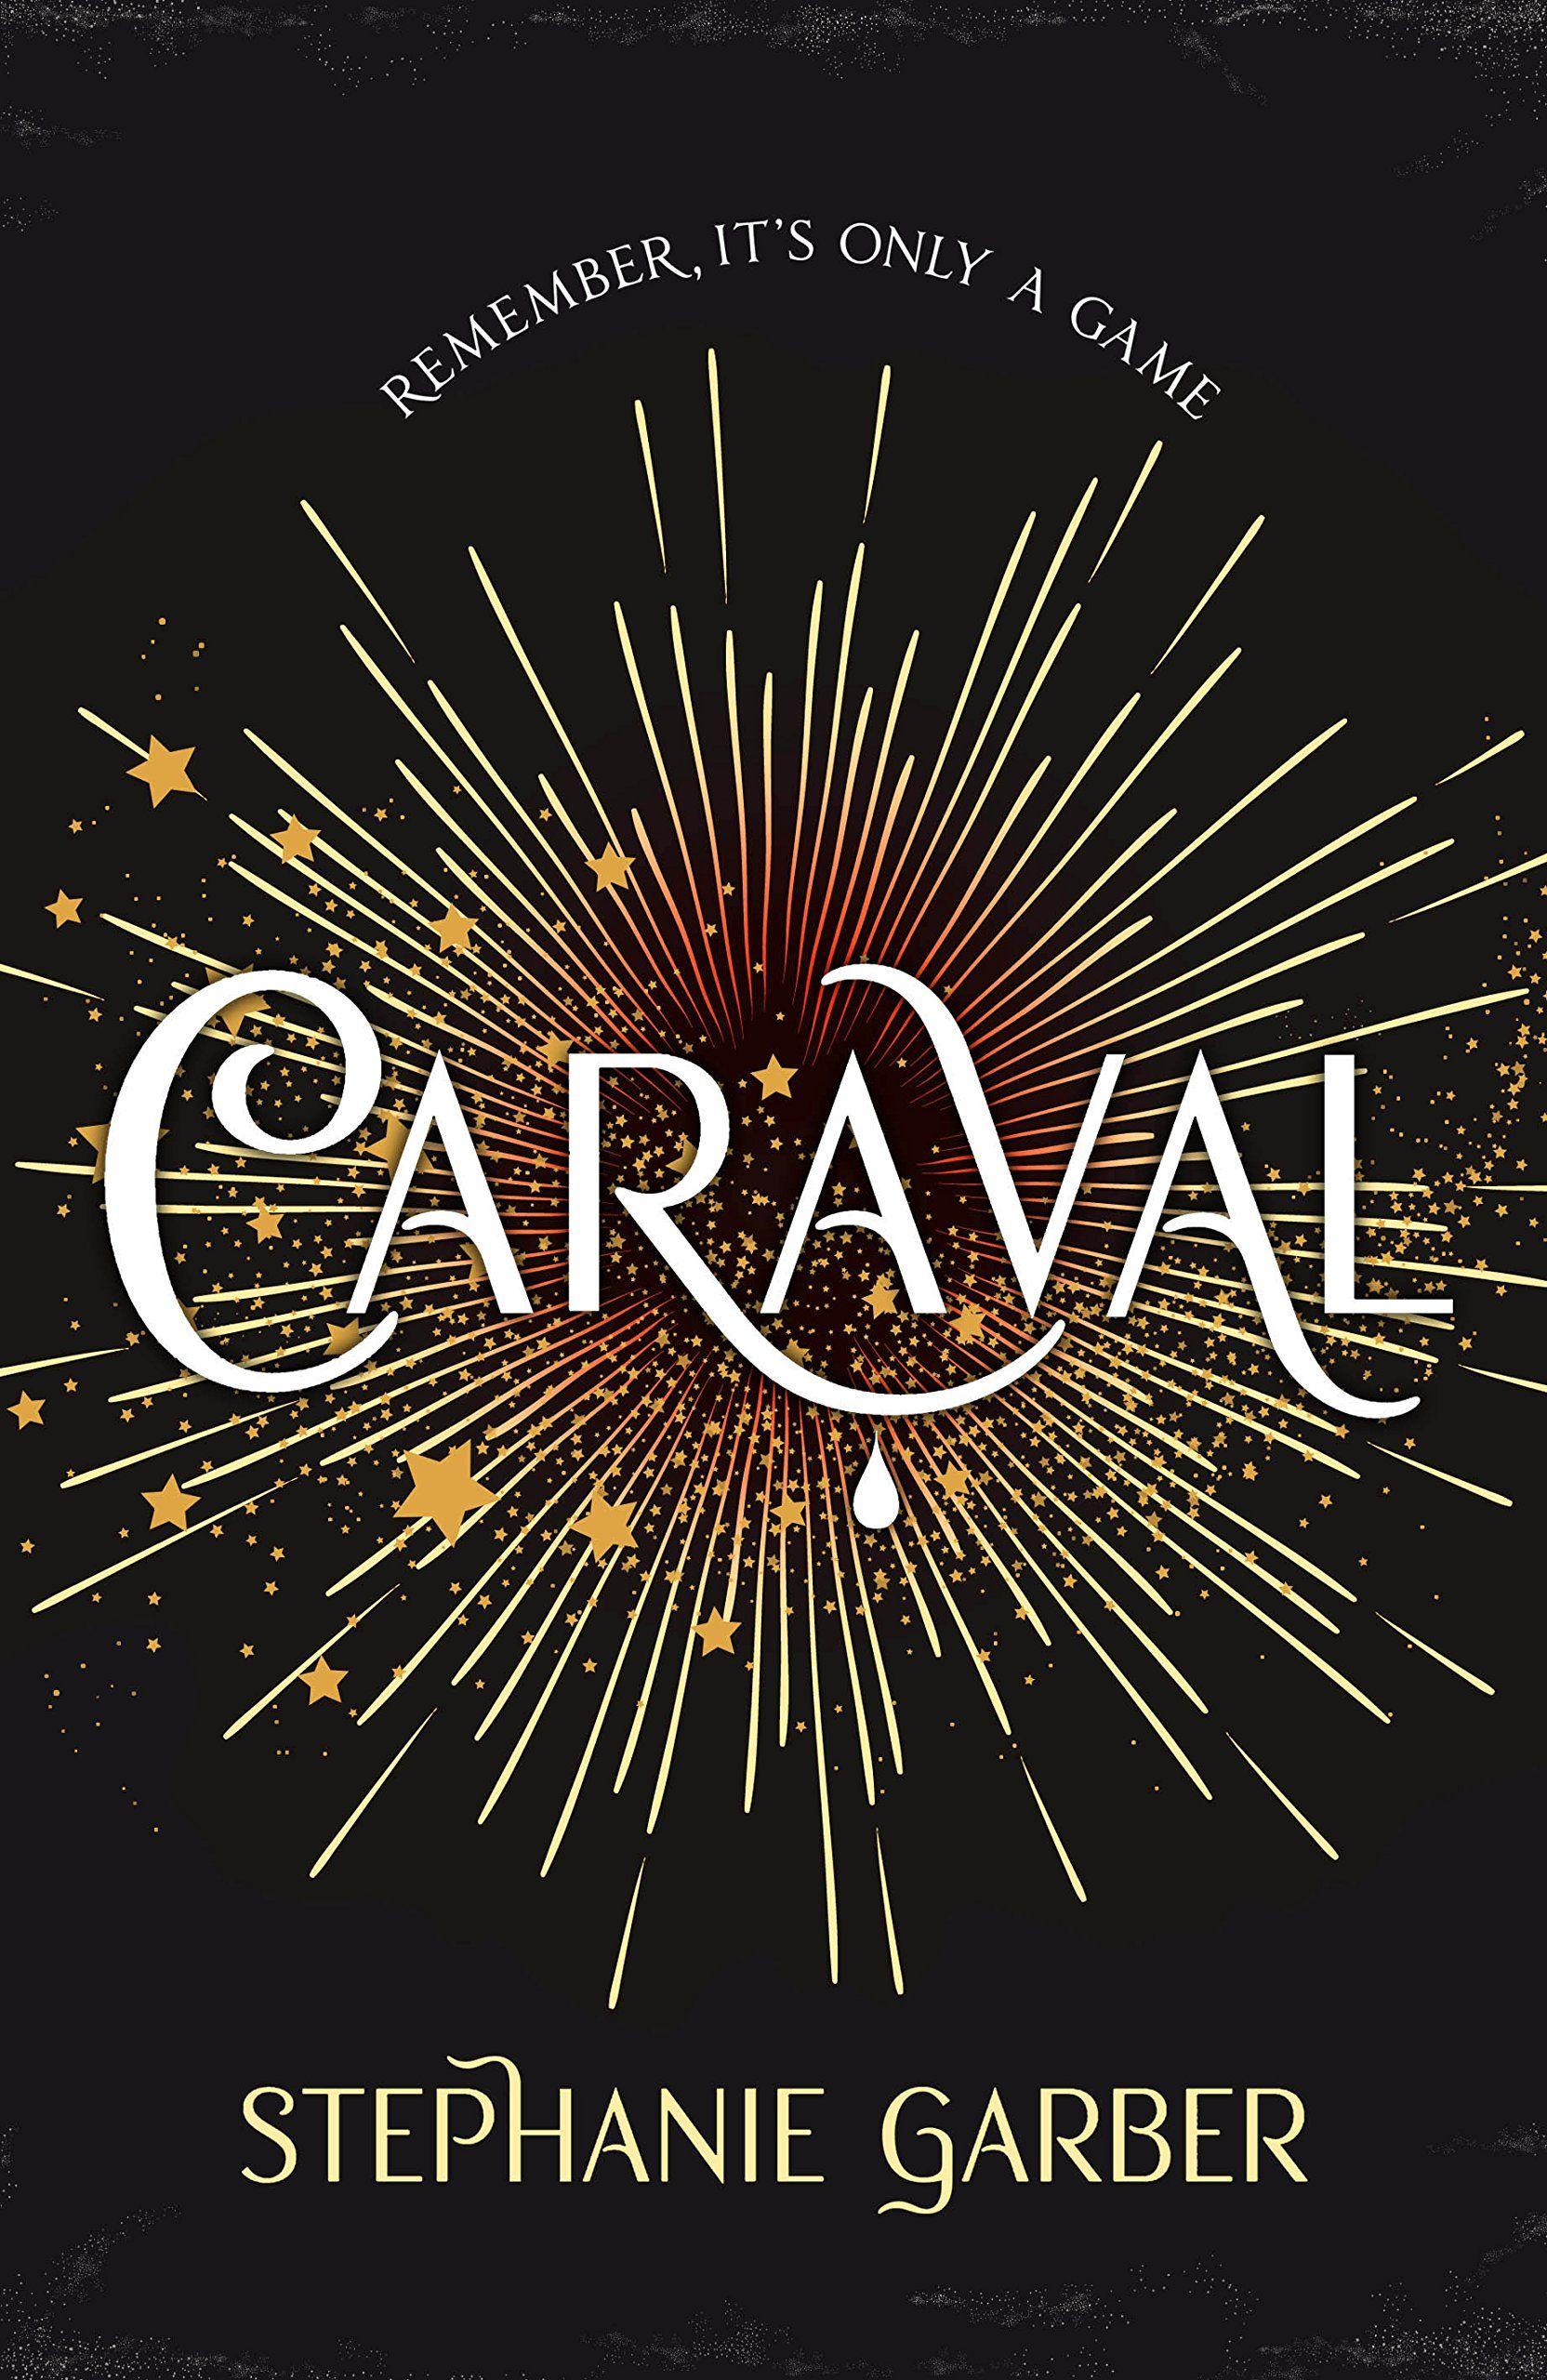 Caraval tome 1 Stephanie Garber avis blogueur